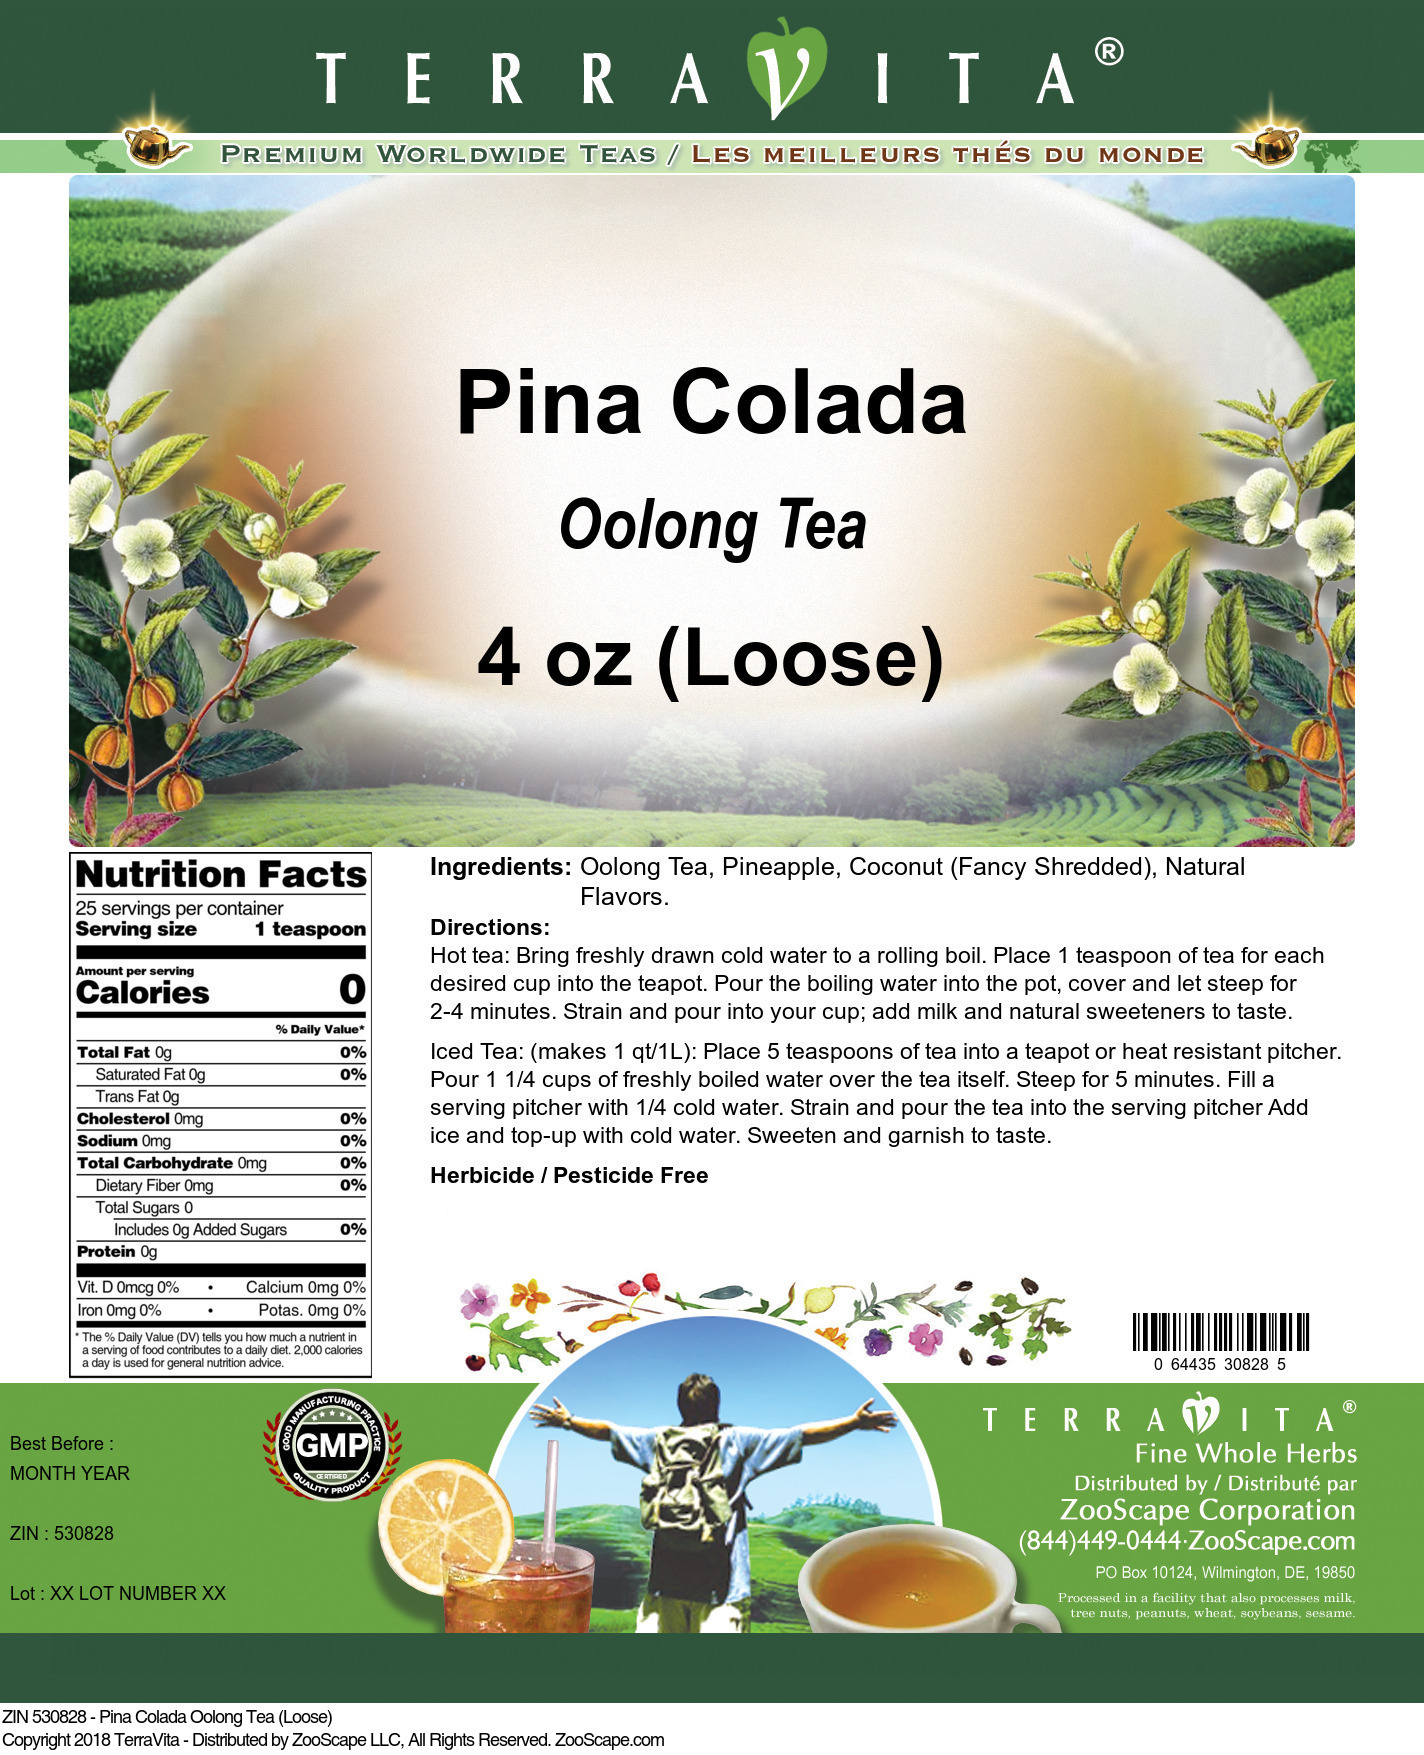 Pina Colada Oolong Tea (Loose)